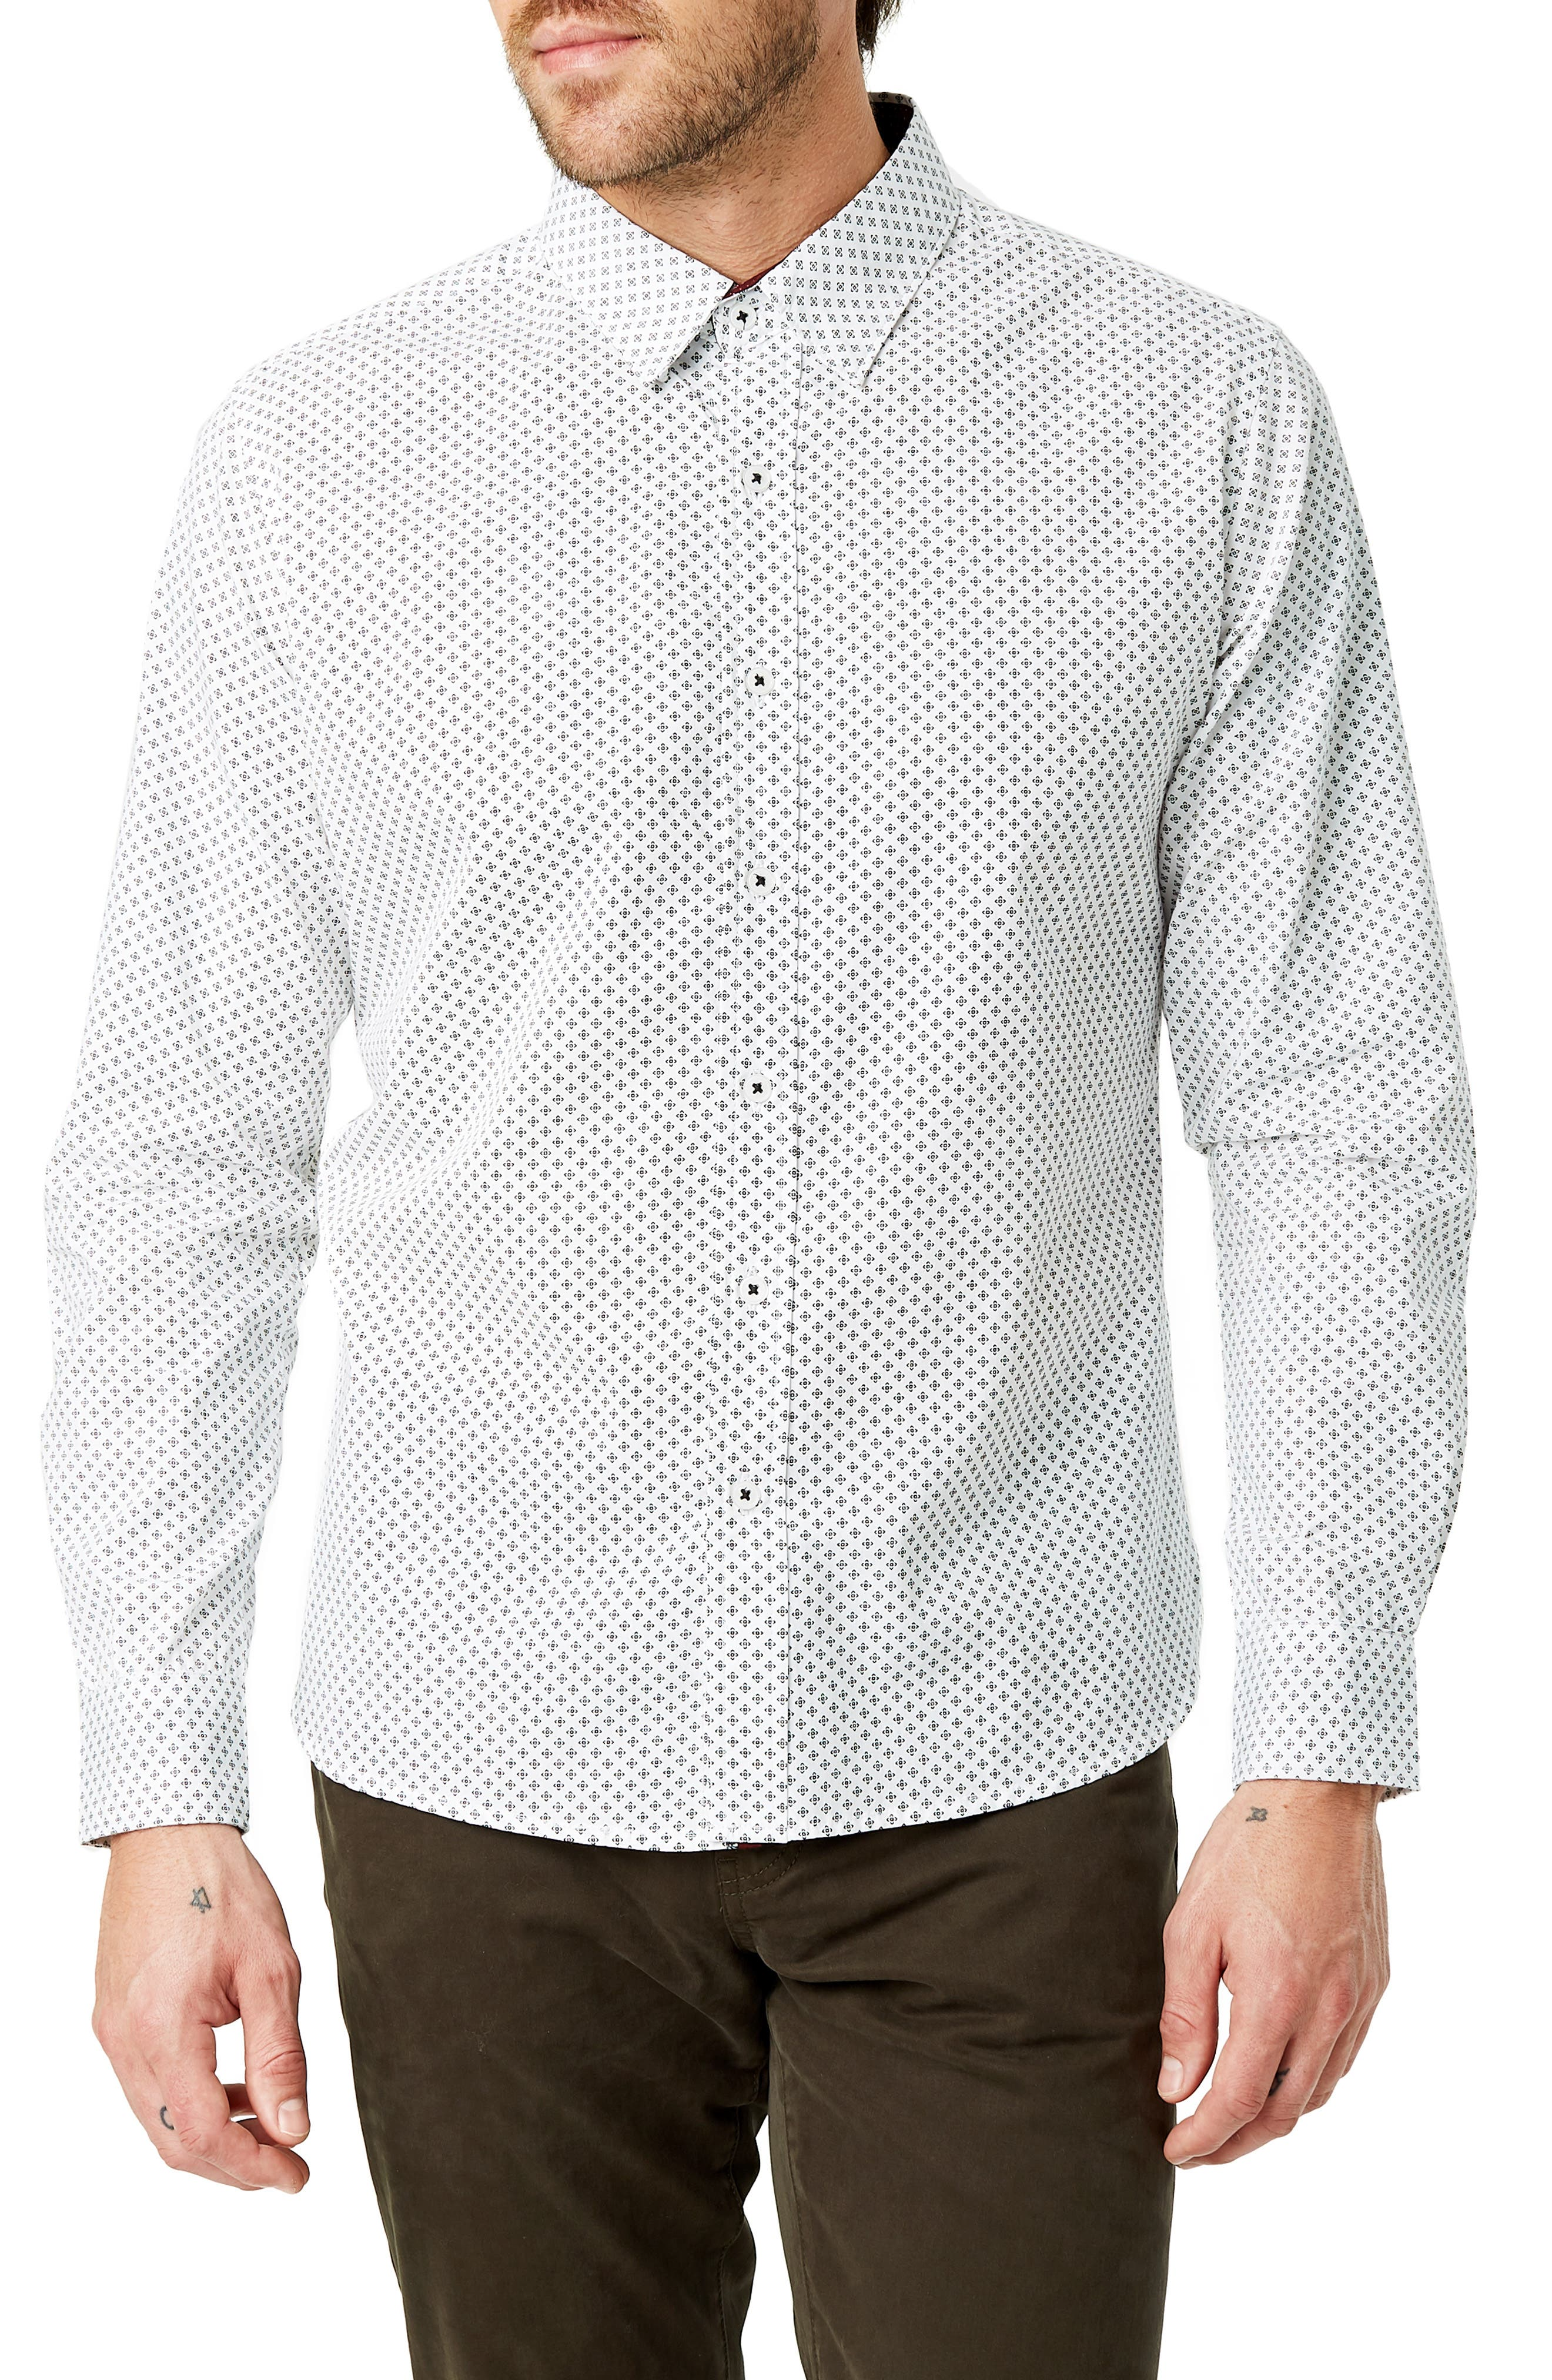 Radio Mix Slim Fit Sport Shirt,                             Main thumbnail 1, color,                             WHITE